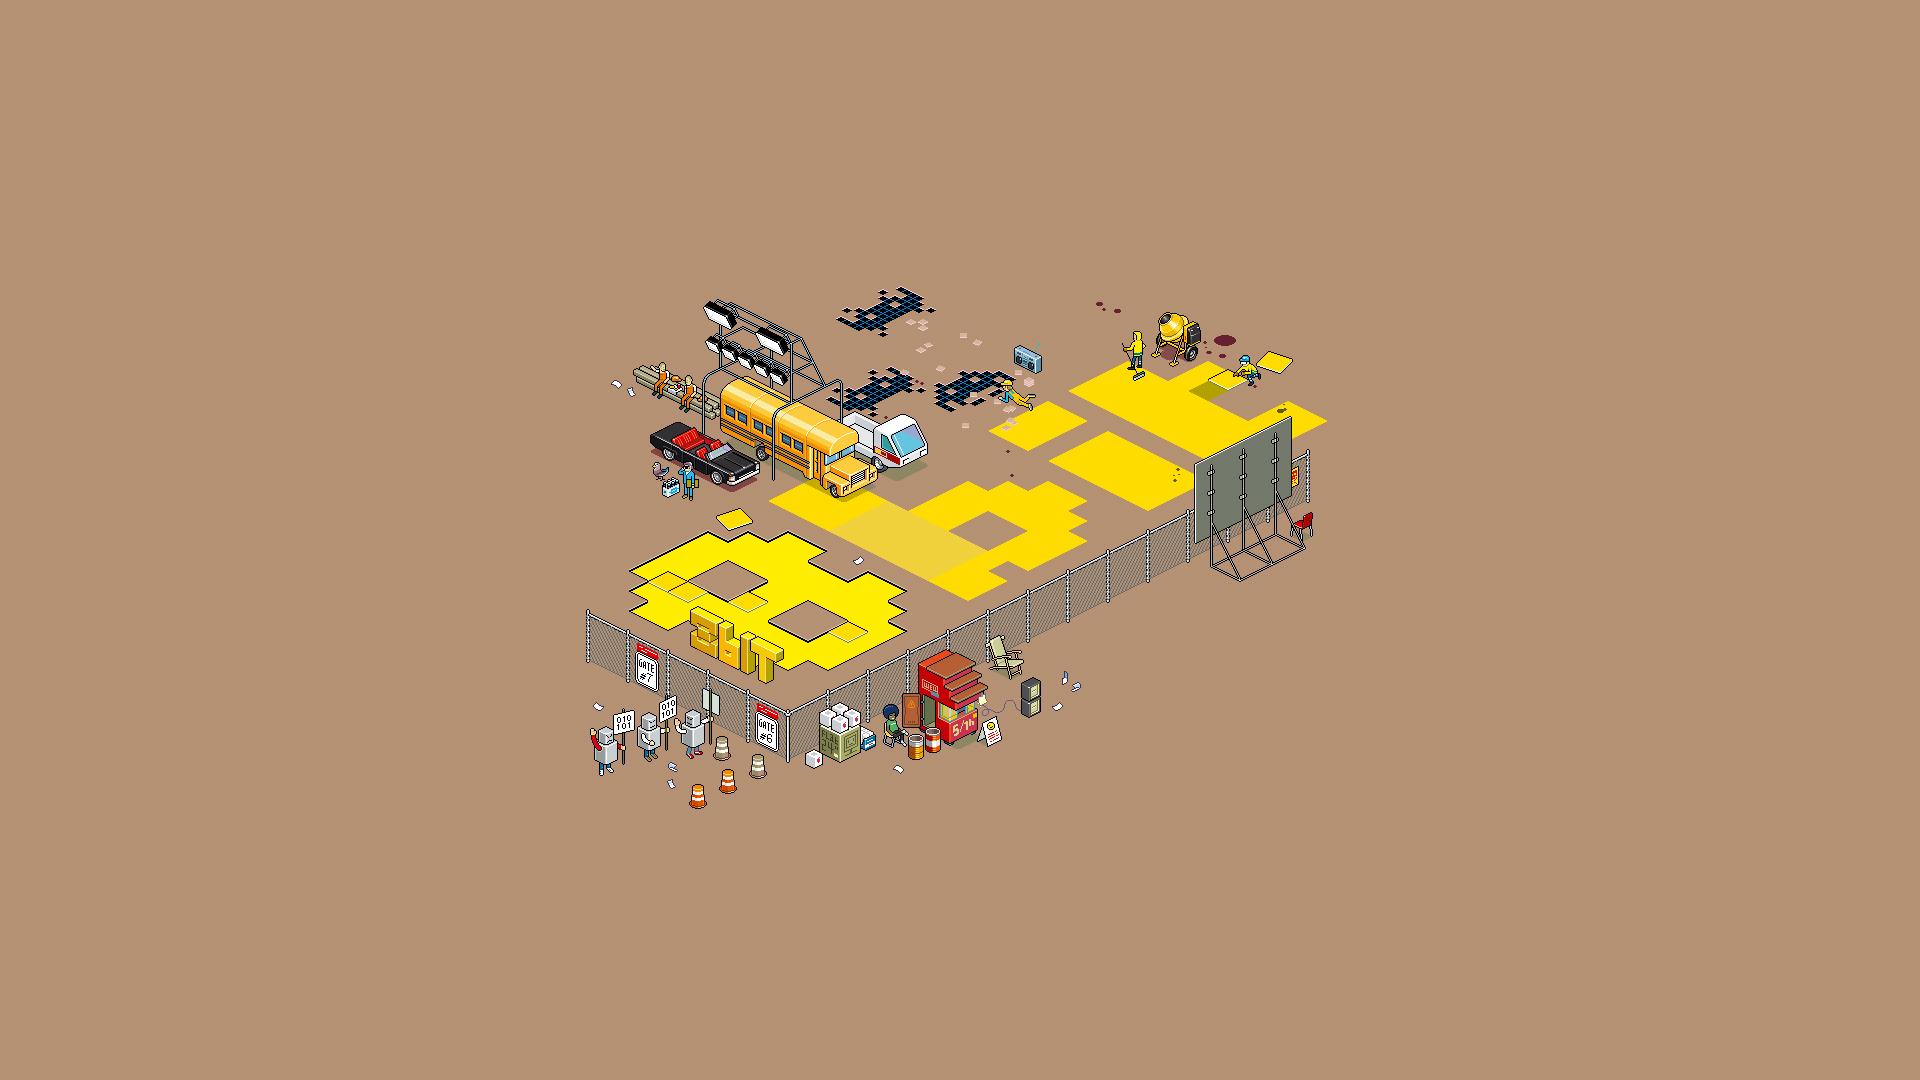 8-Bit Life